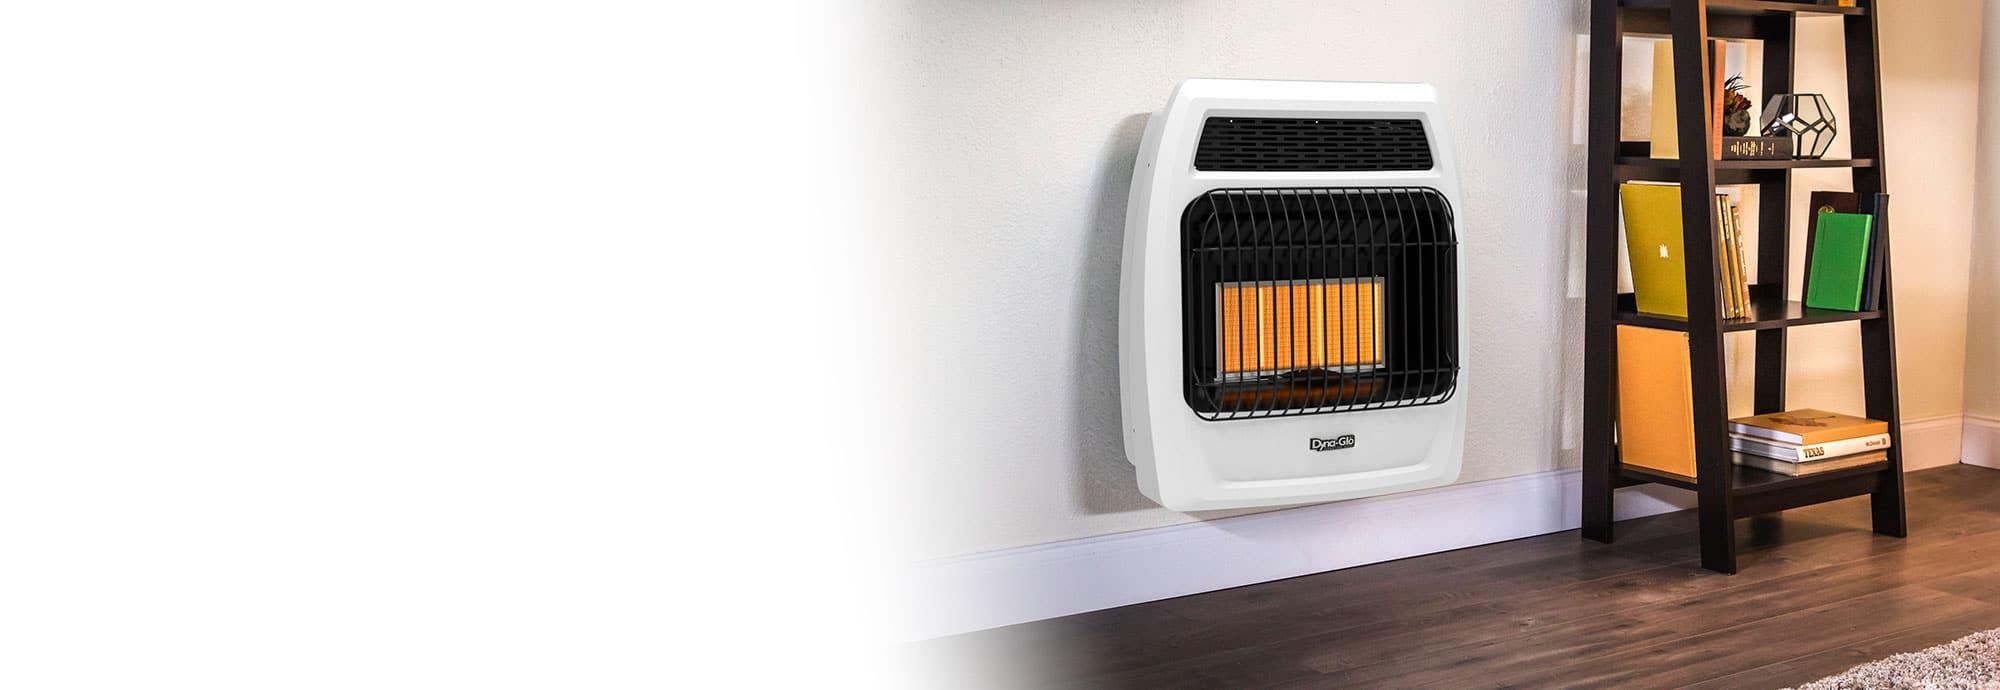 Dyna Glo Heater 1